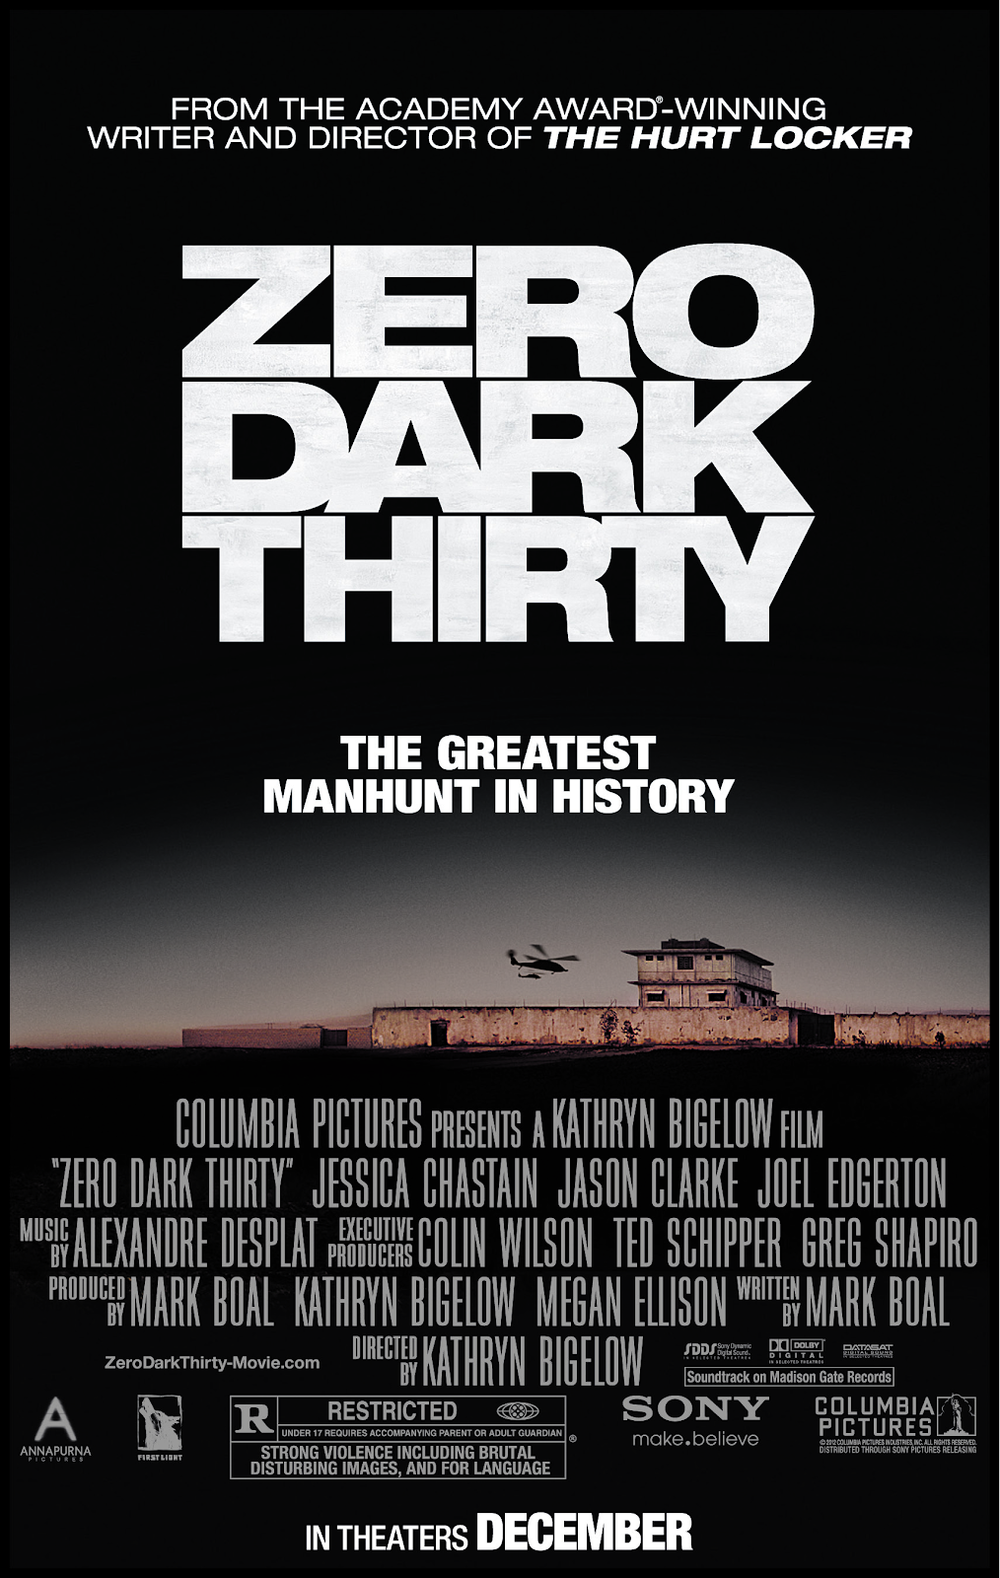 Kathryn Bigelow , Mark Boal , Jessica Chastain , Joel Edgerton , Chris Pratt